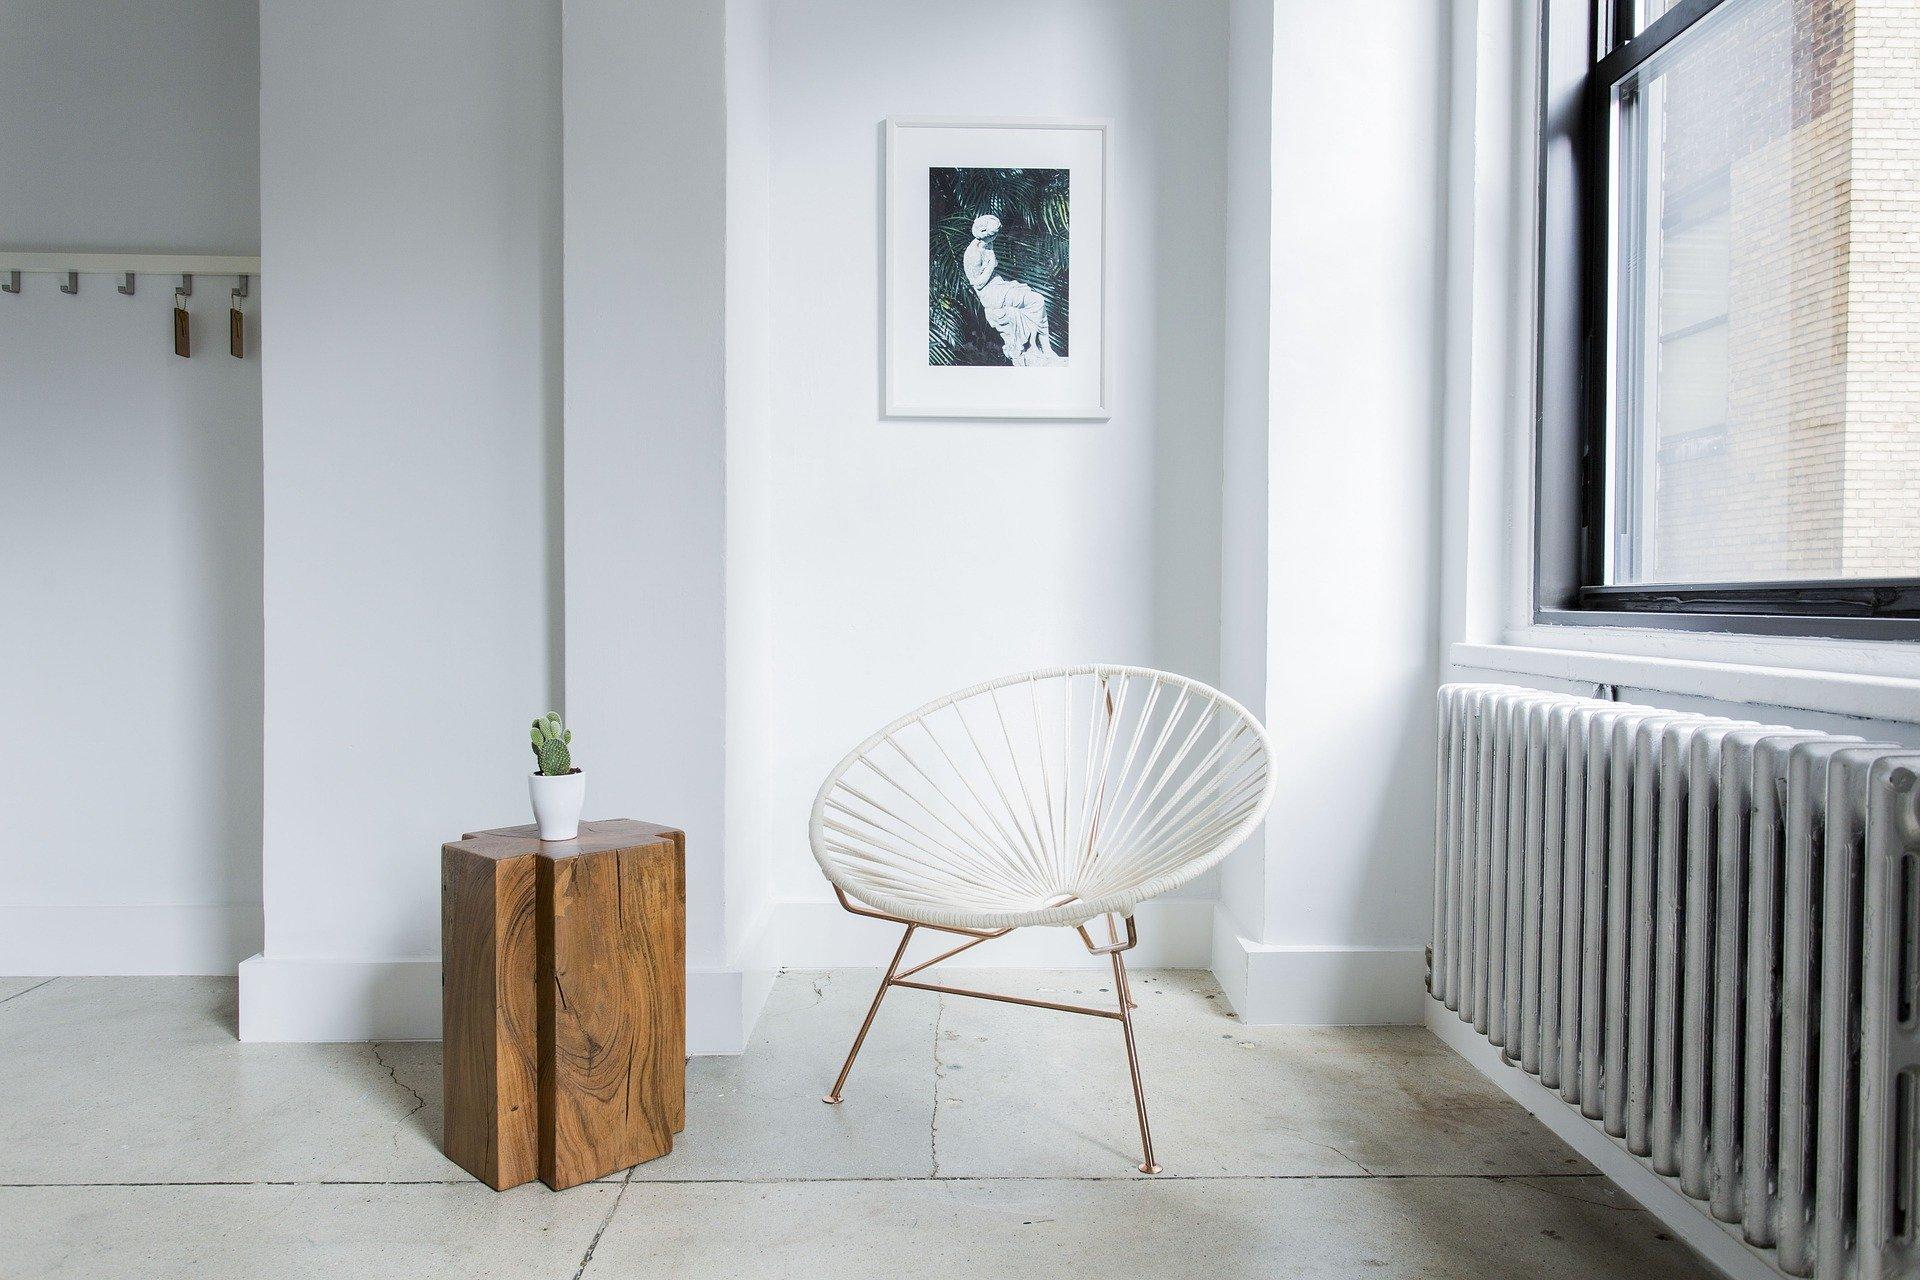 Linoleum – alter Hässlon-Boden oder sexy Naturprodukt?